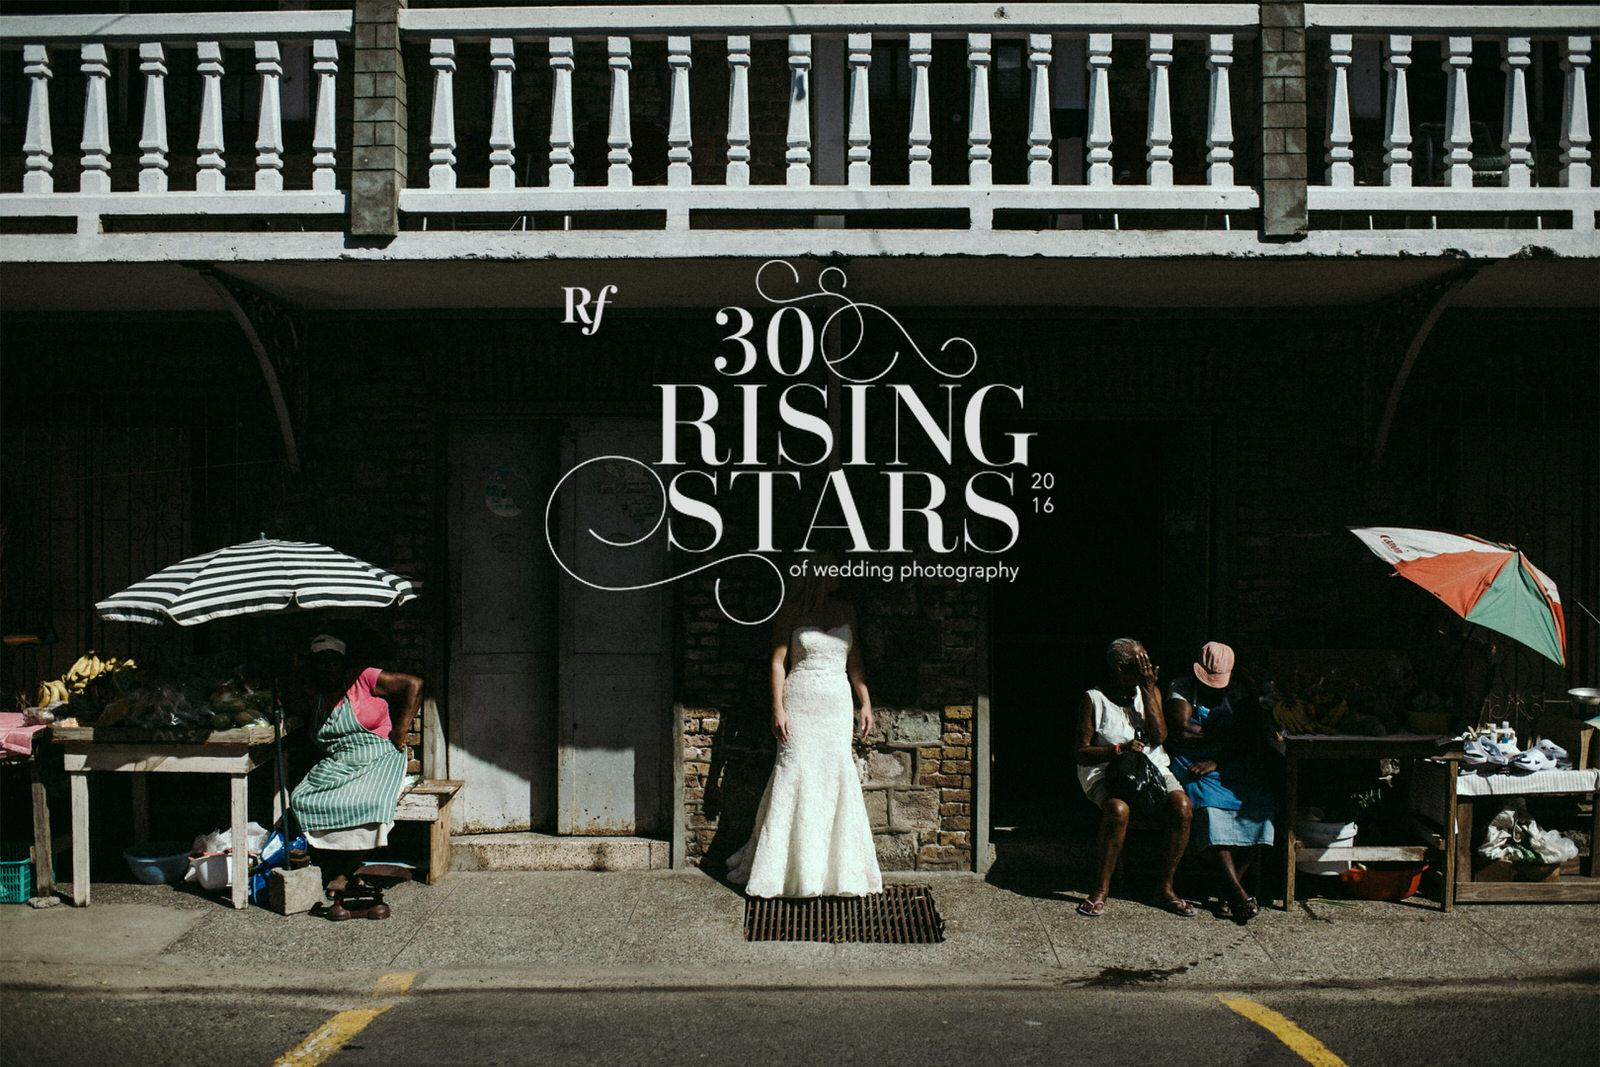 30 rising stars in weding photography-1.jpg